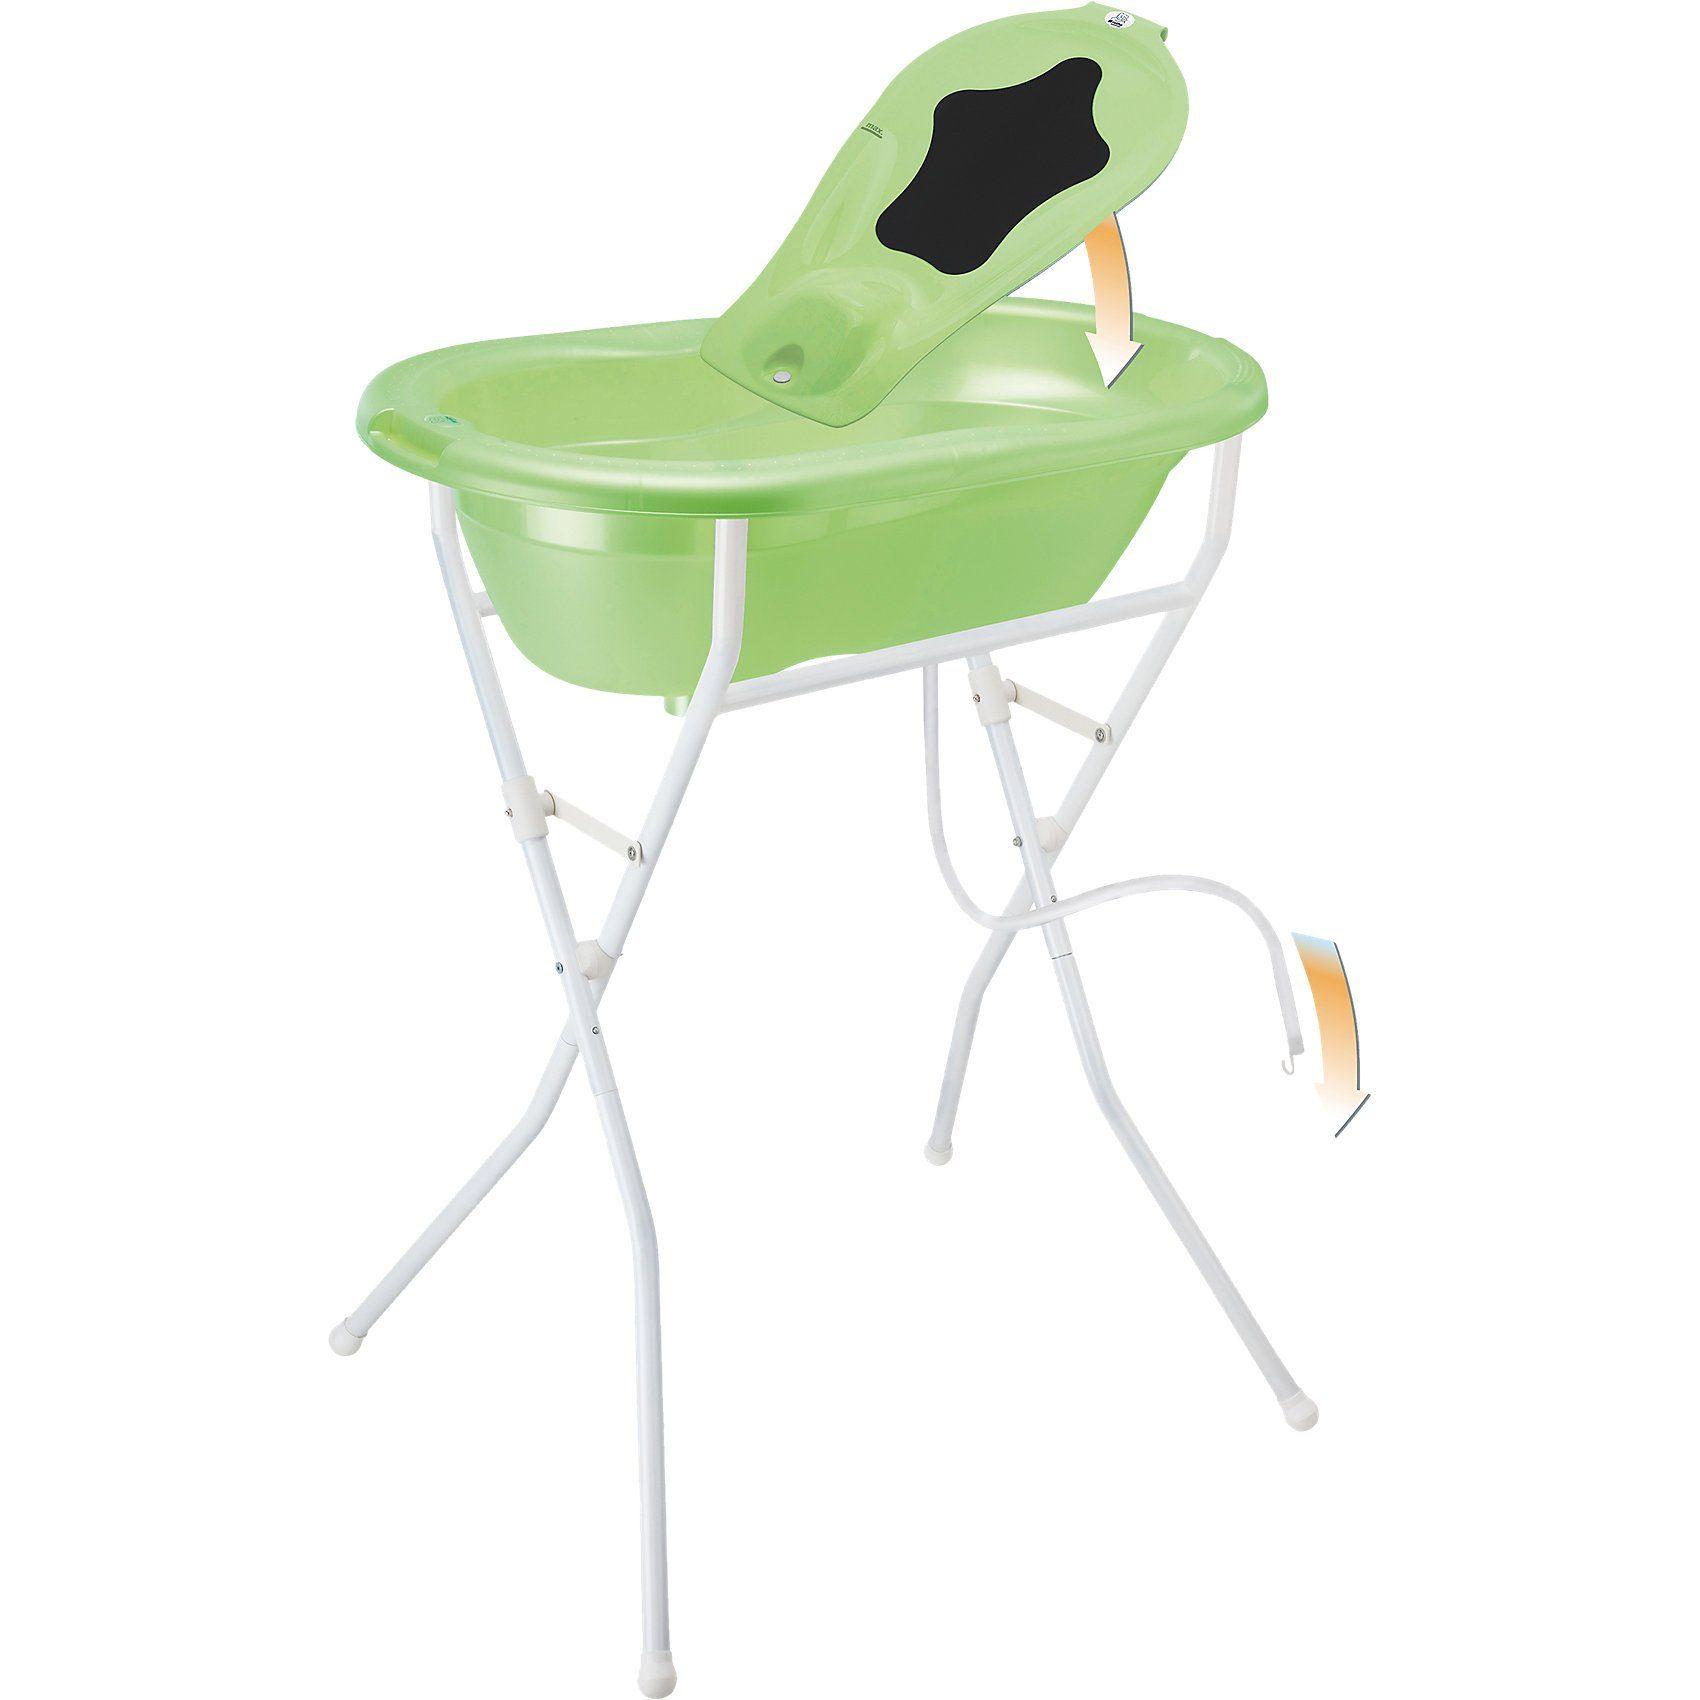 rotho babydesign Badelösung Top, lindgrün perl